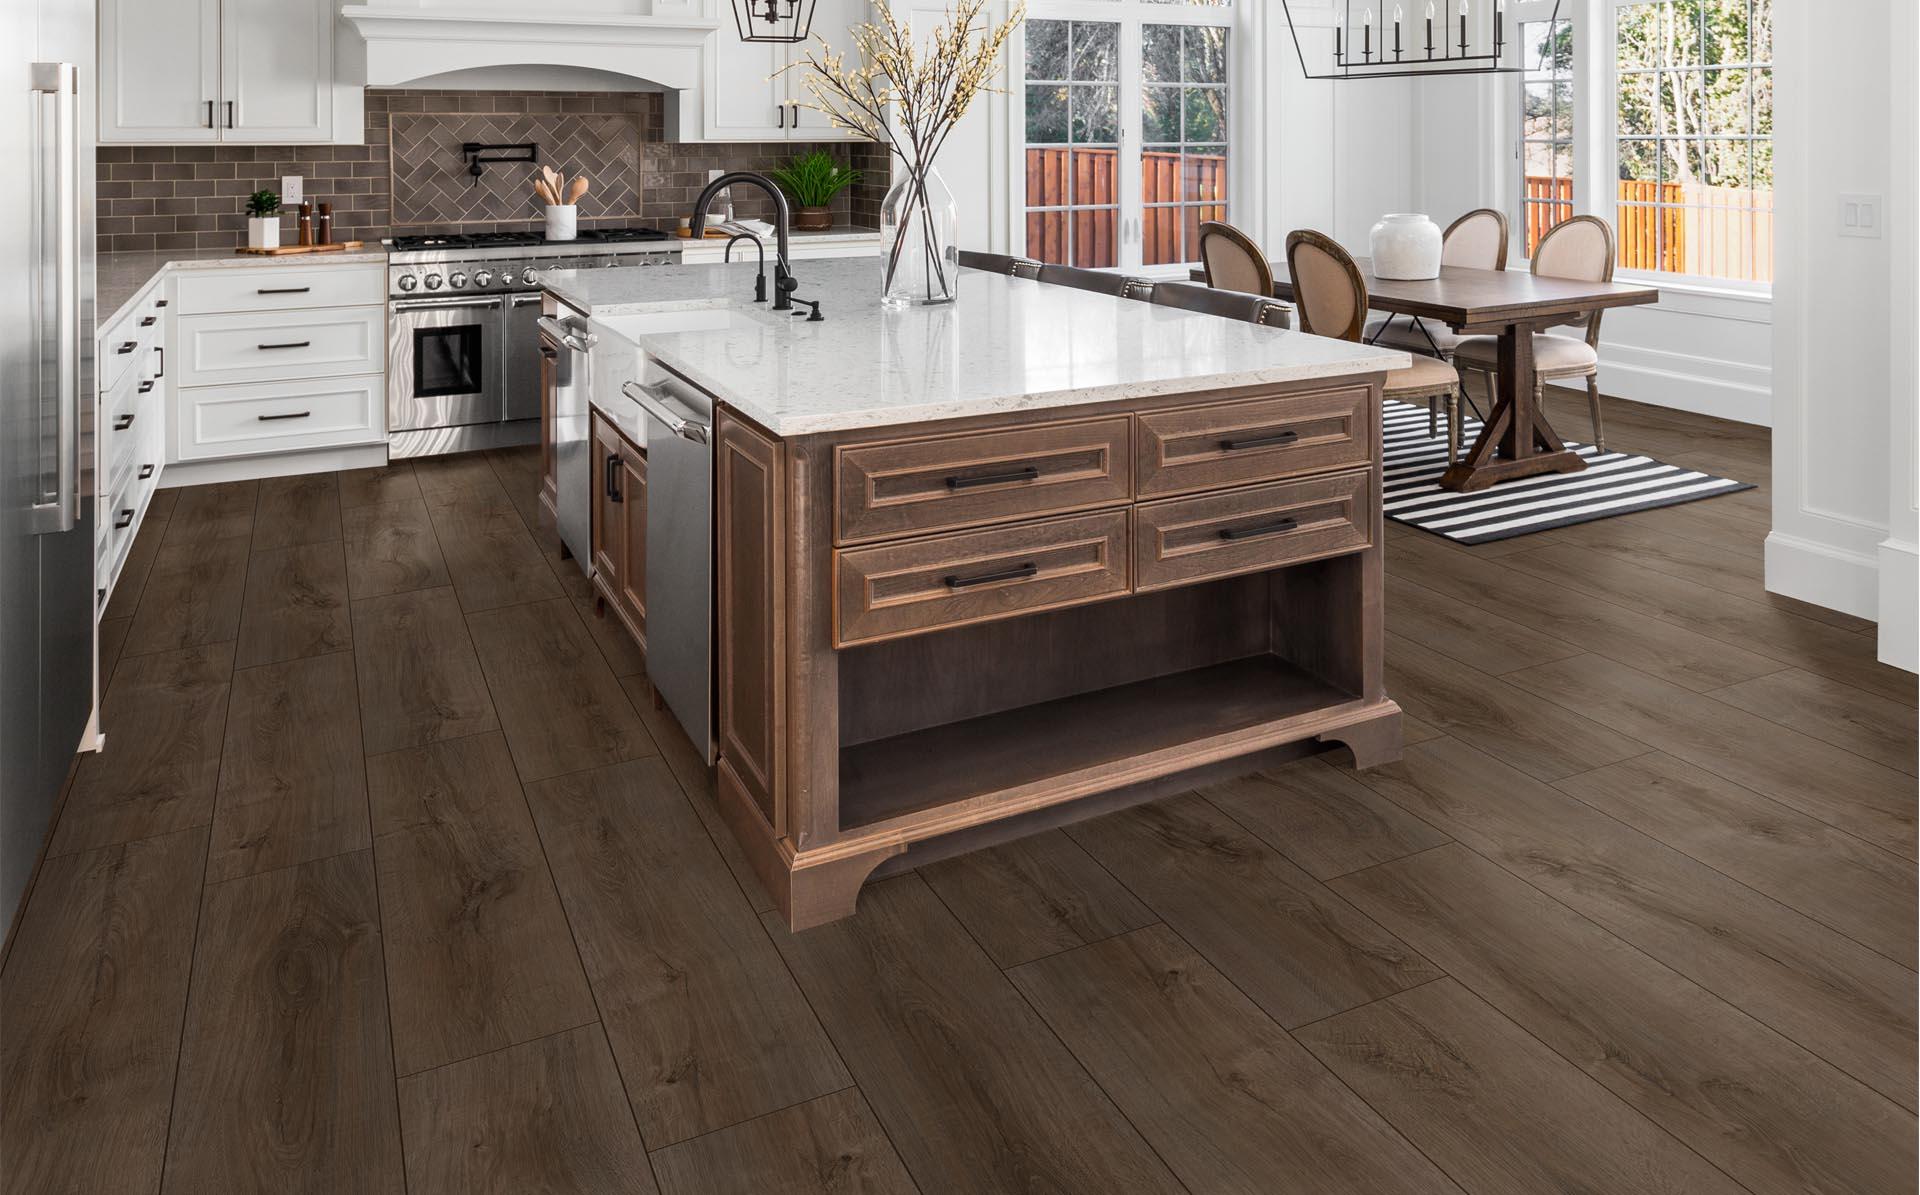 Collections United States Of America, Prestige Laminate Flooring Atroguard